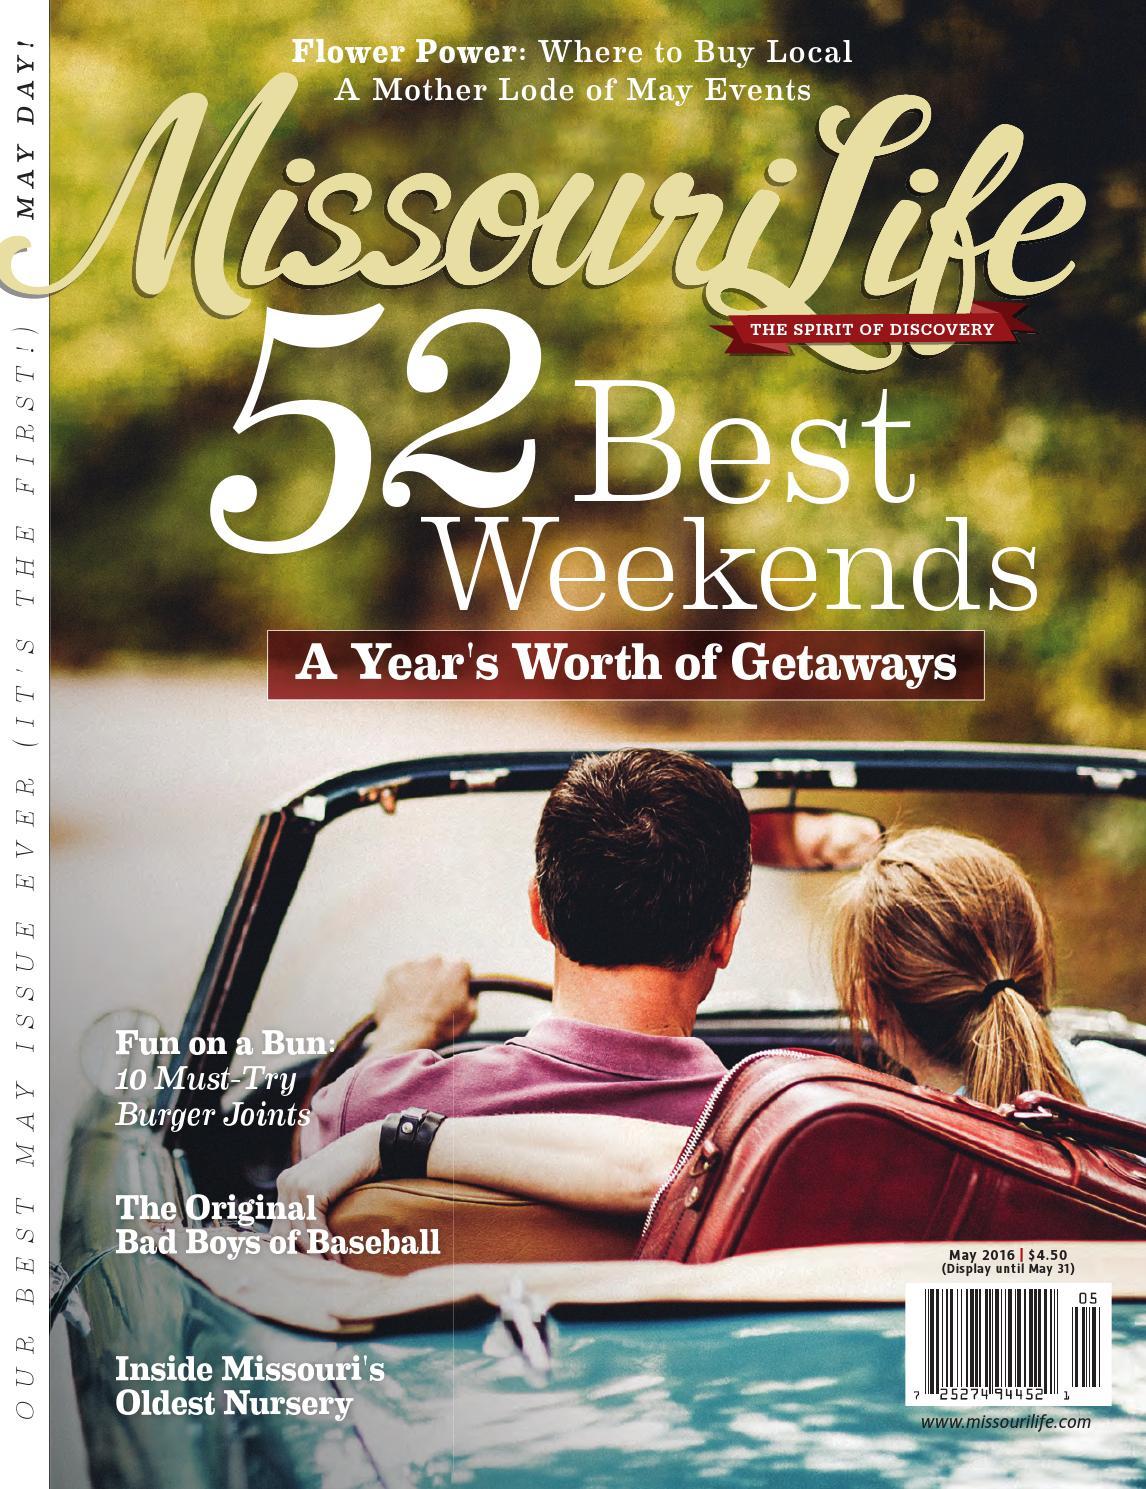 Missouri Life May 2016 by Missouri Life Magazine - issuu